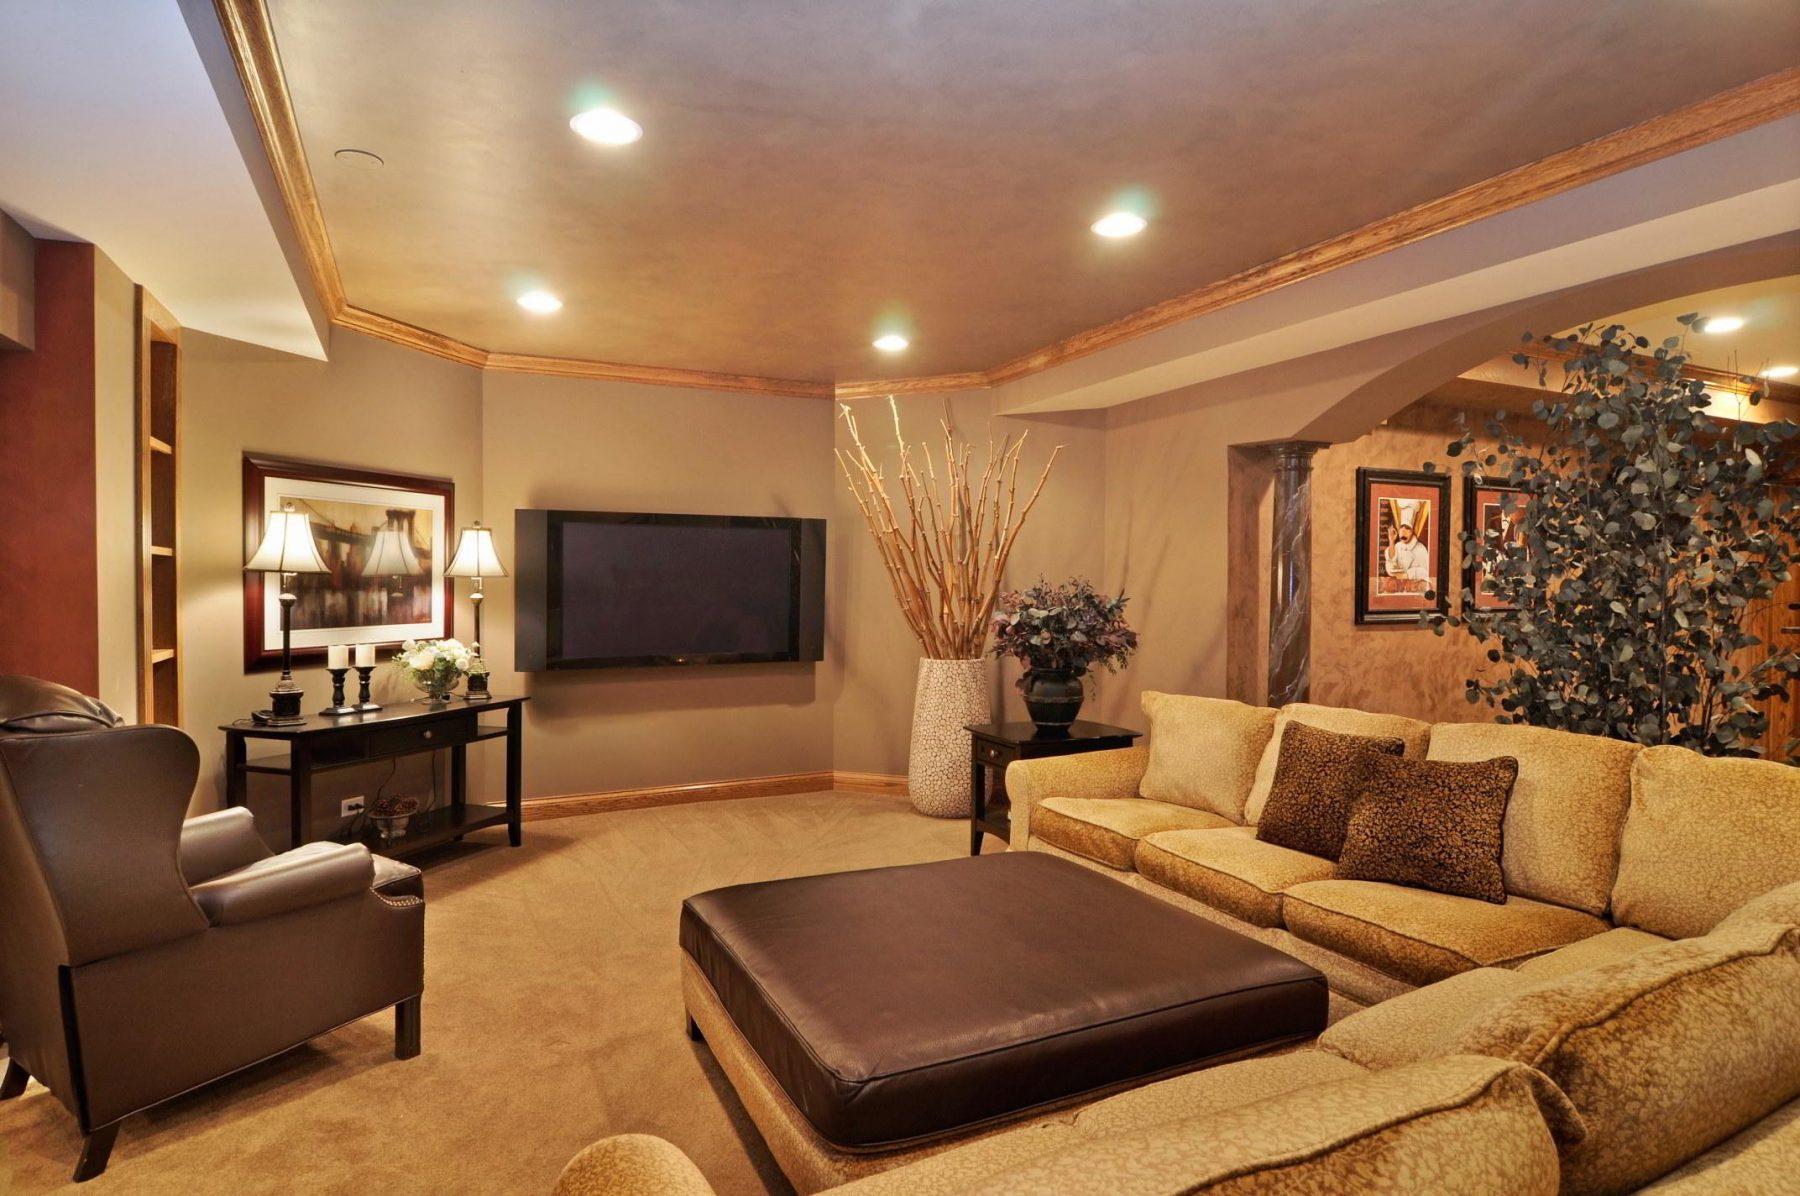 Home Remodeling Interior Design Arlington Heights IL | Basement Renovations